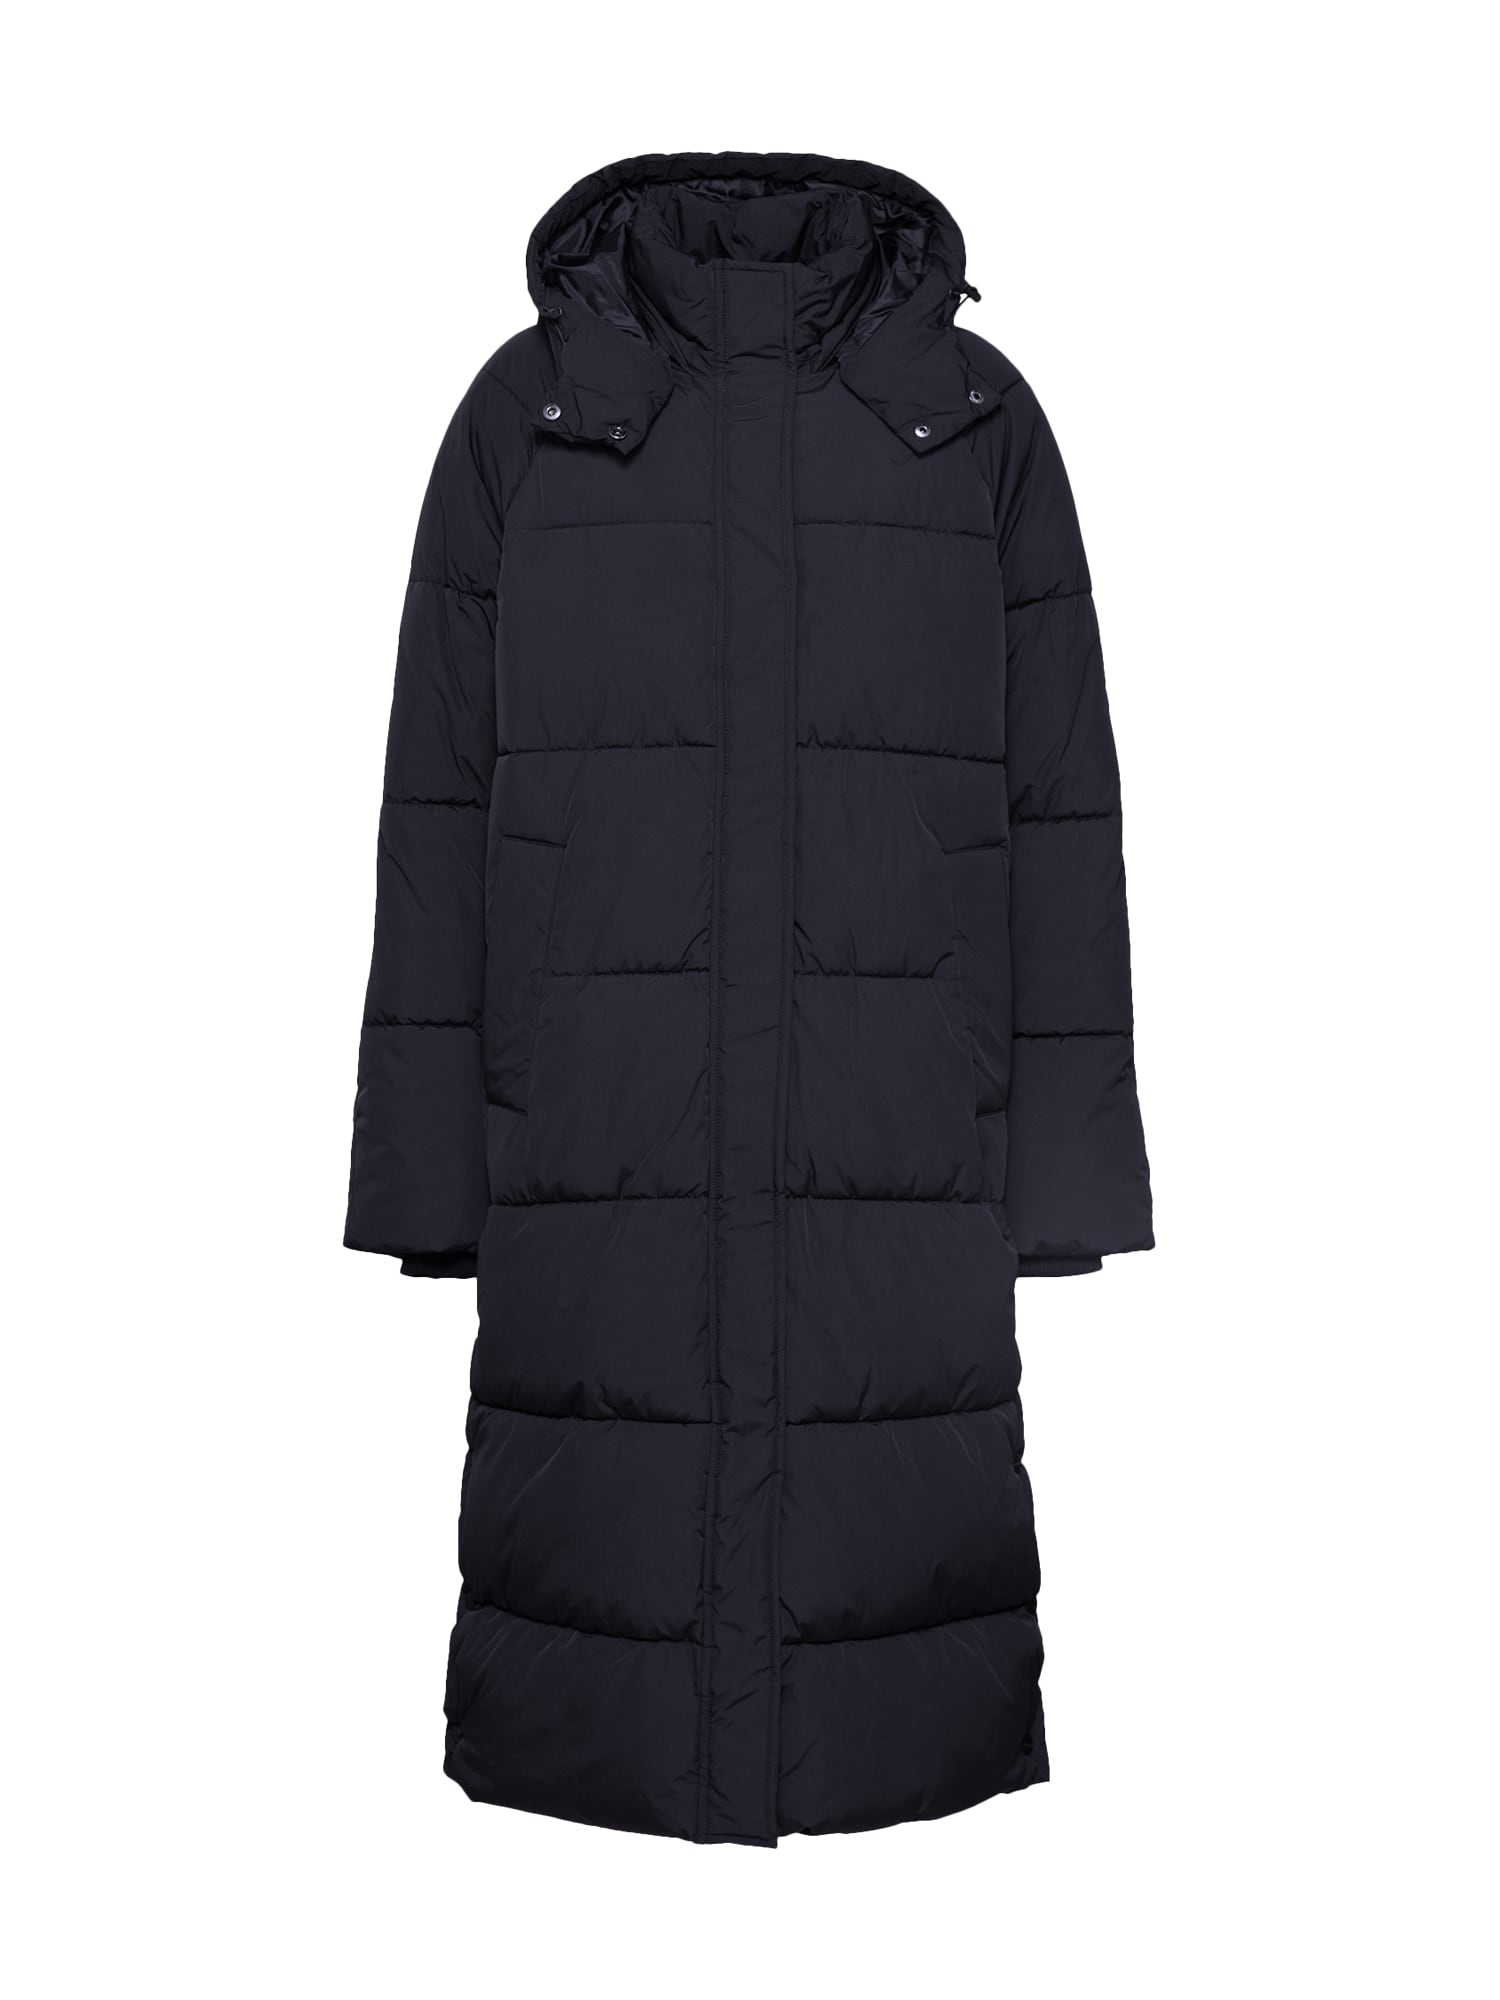 mbym Žieminis paltas 'Ela Slit' juoda